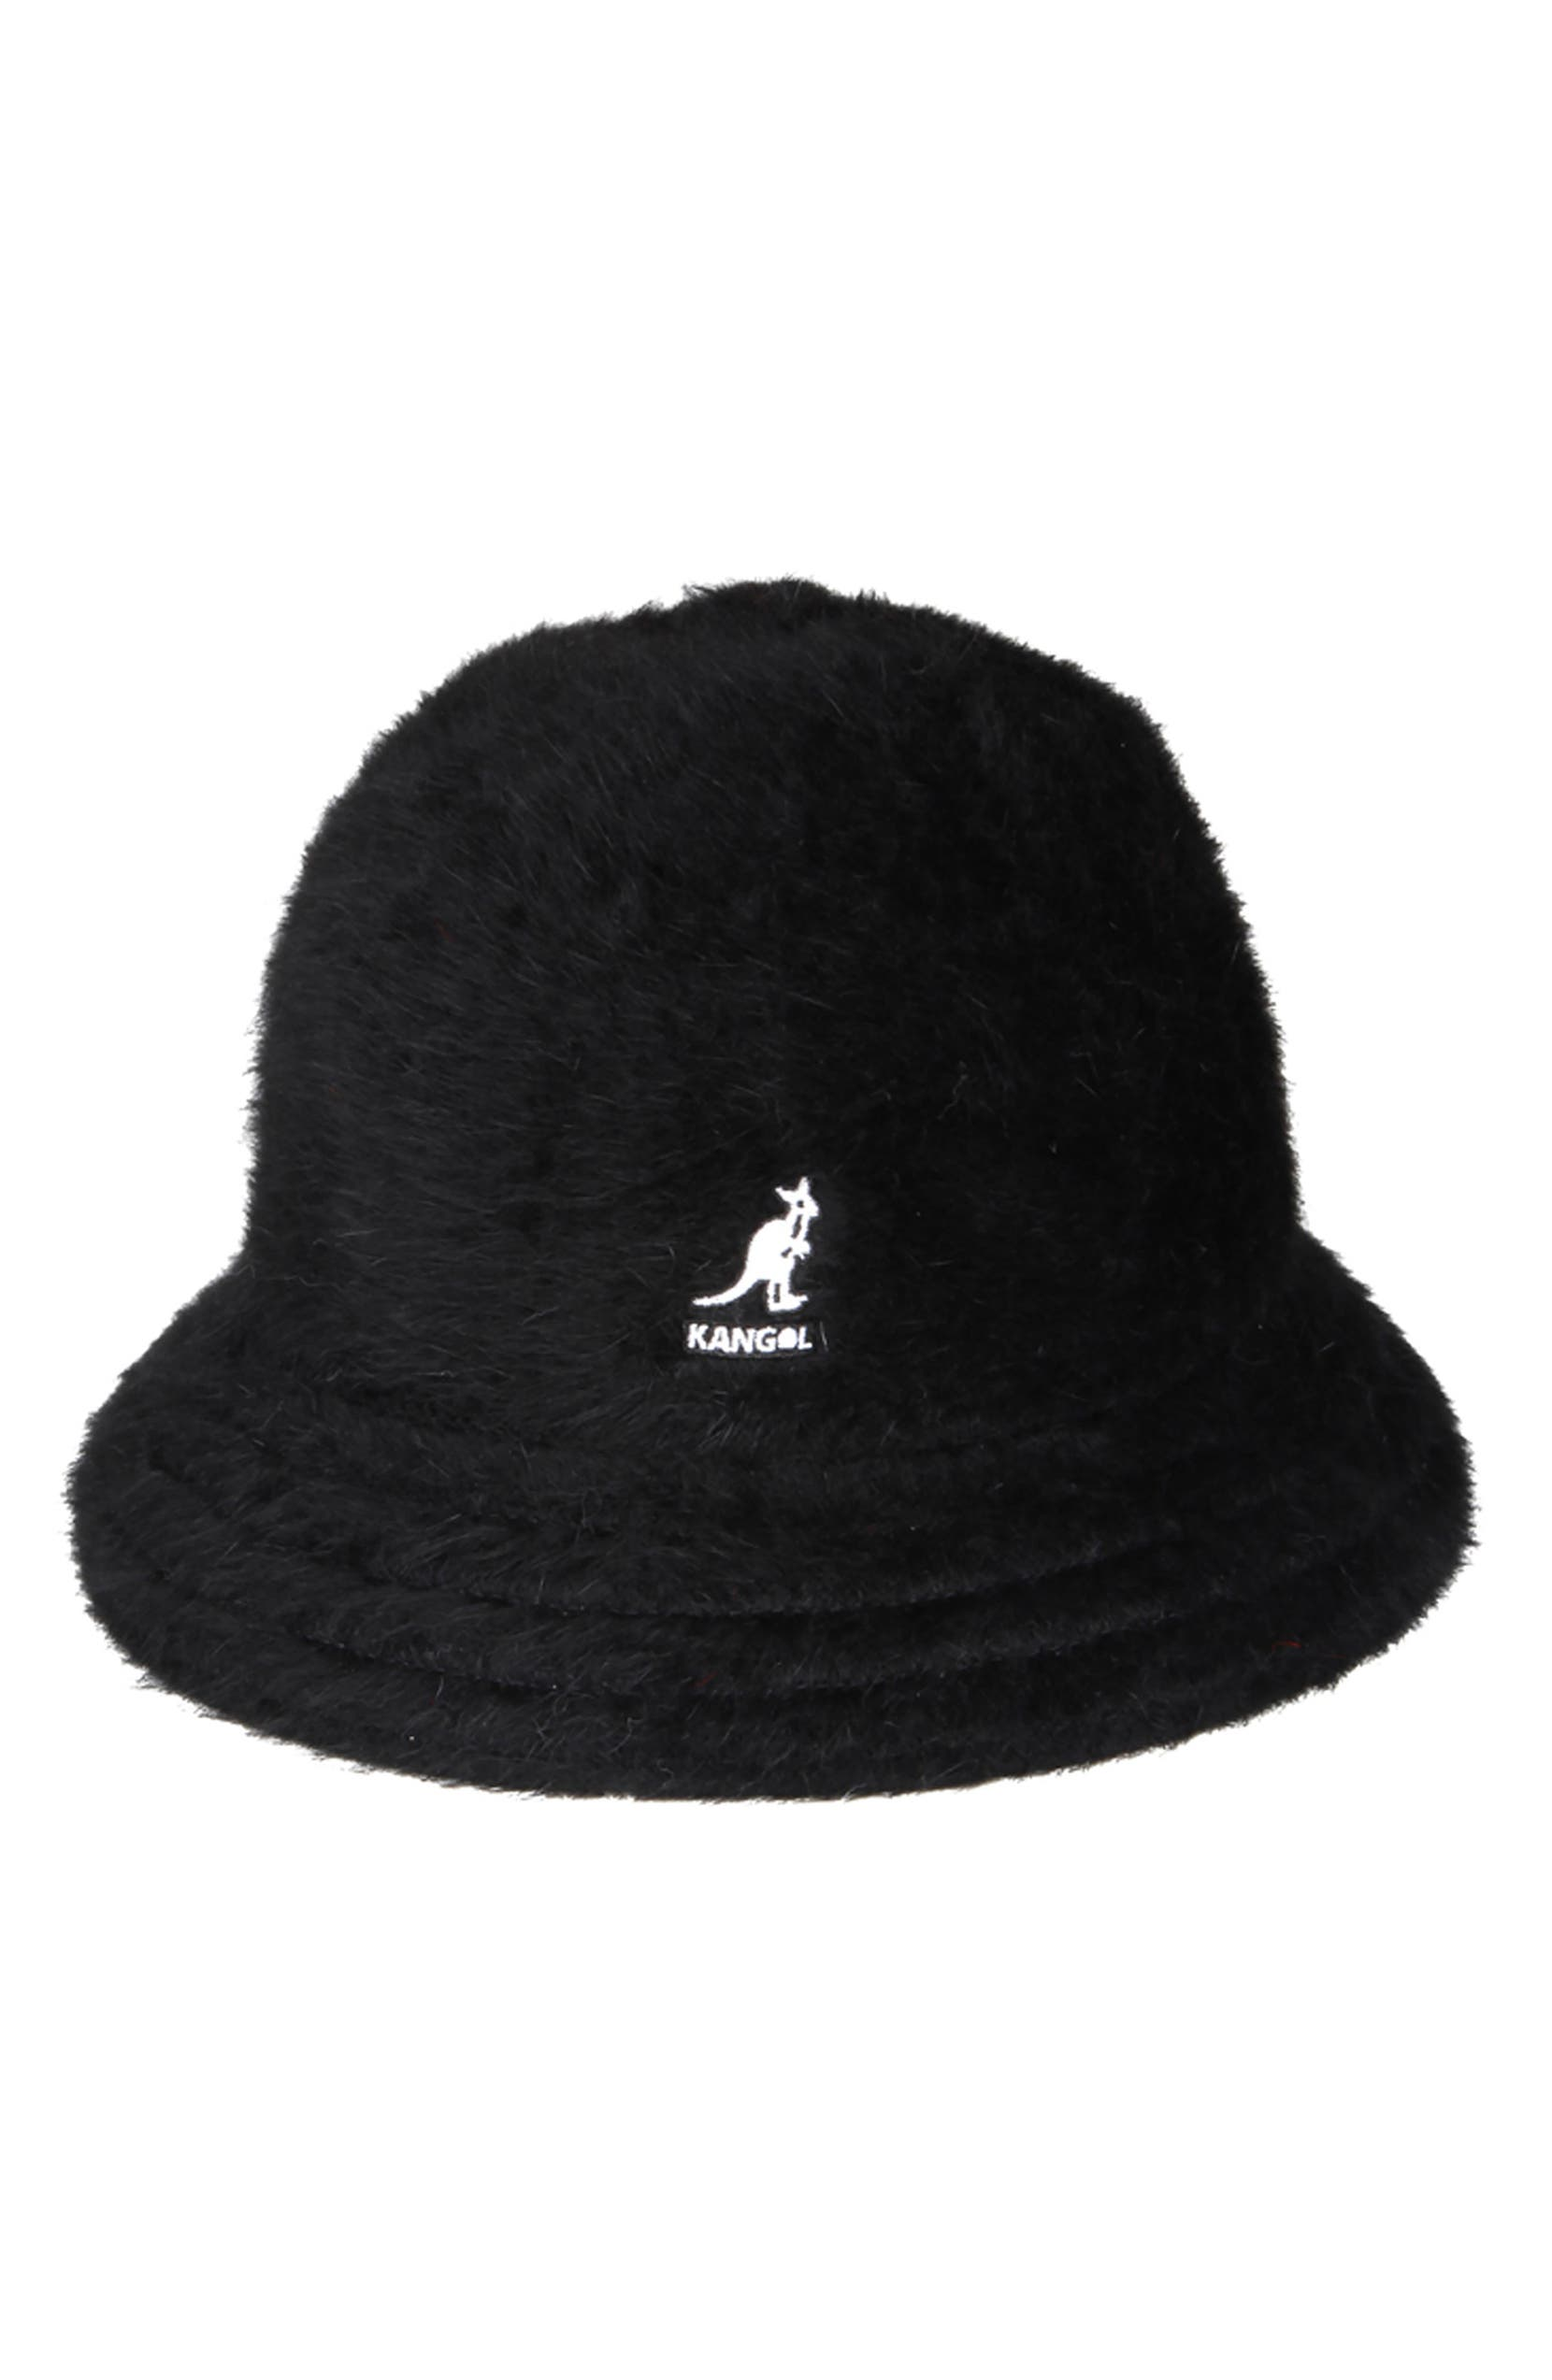 Kangol Furgora Casual Bucket Hat  a1875febdb4